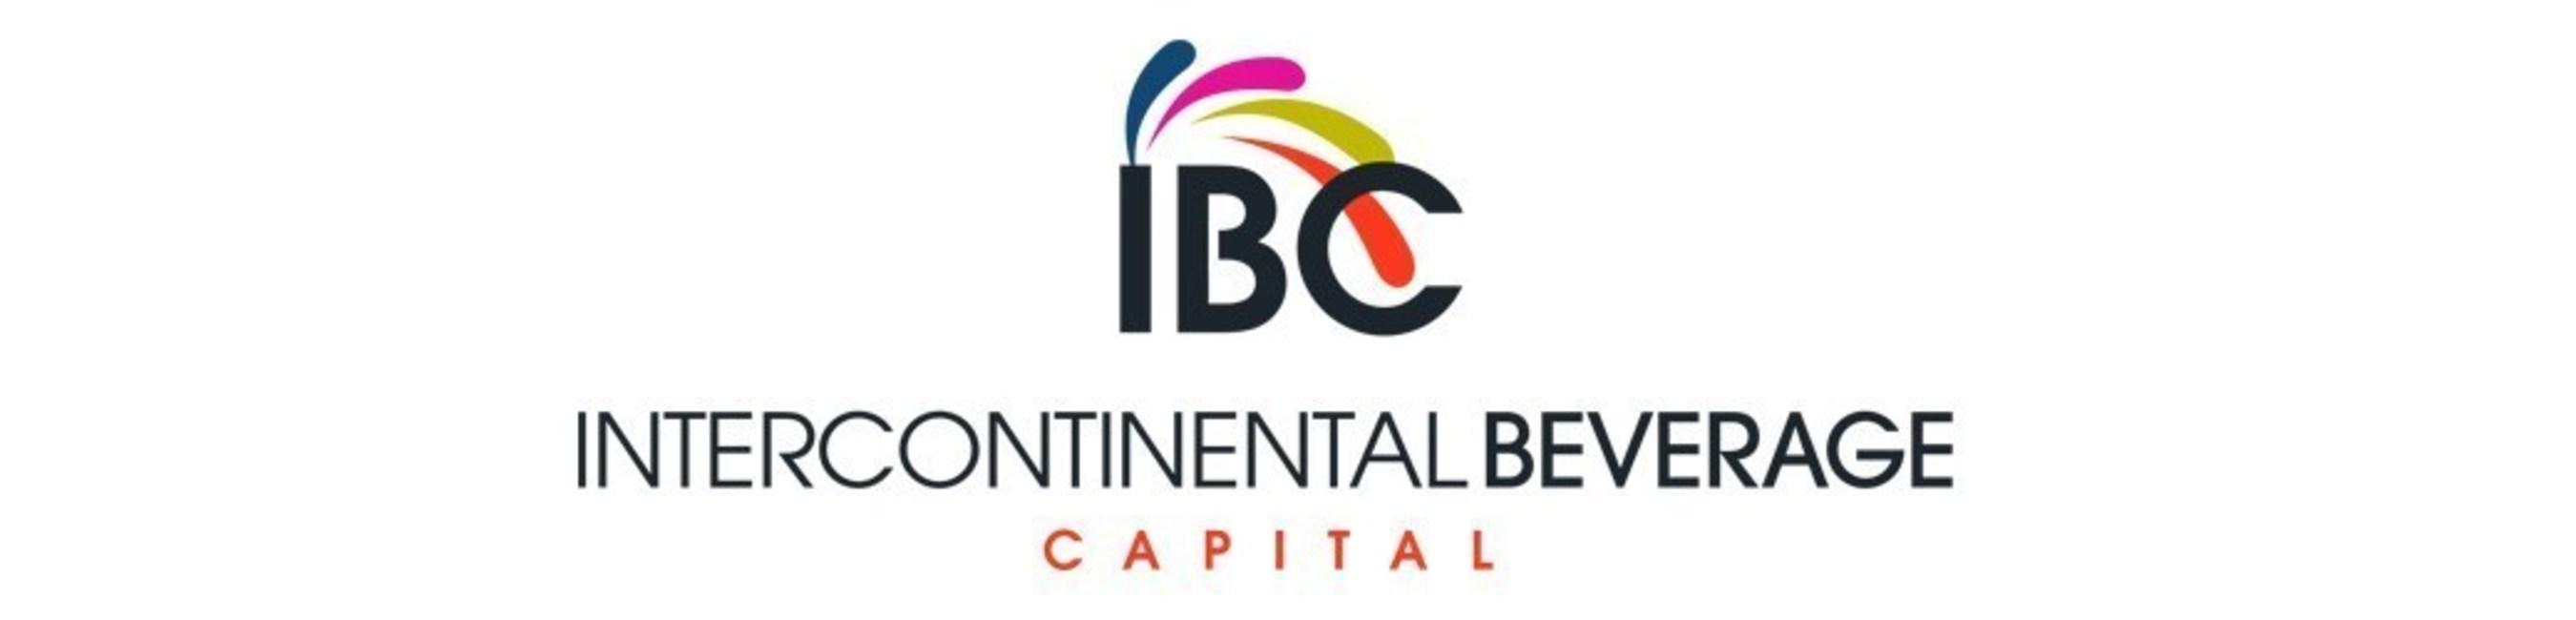 InterContinental Beverage Capital Teams with Miami Bay Beverage Company, LLC on trimino™